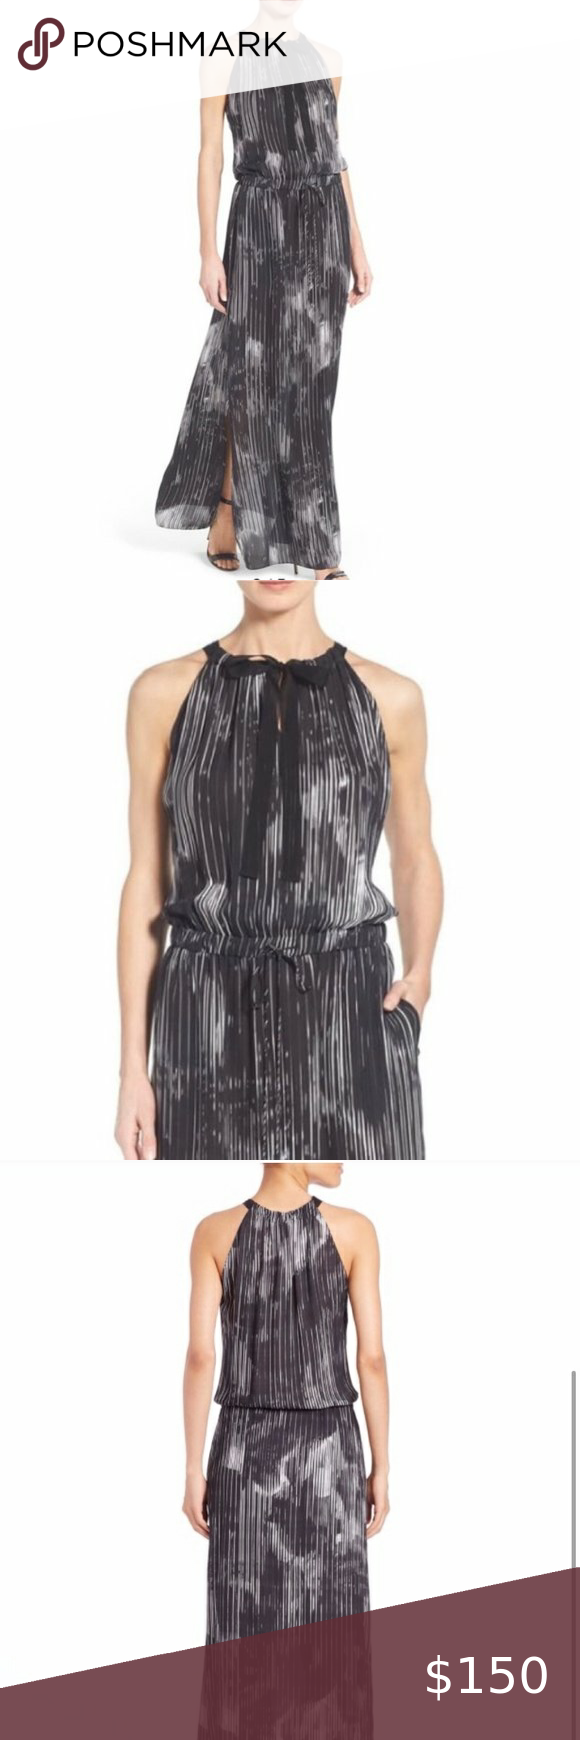 Elie Tahari York Silk Cocktail Maxi Dress Small Maxi Dress Cocktail Comfy Dresses Fashion [ 1740 x 580 Pixel ]